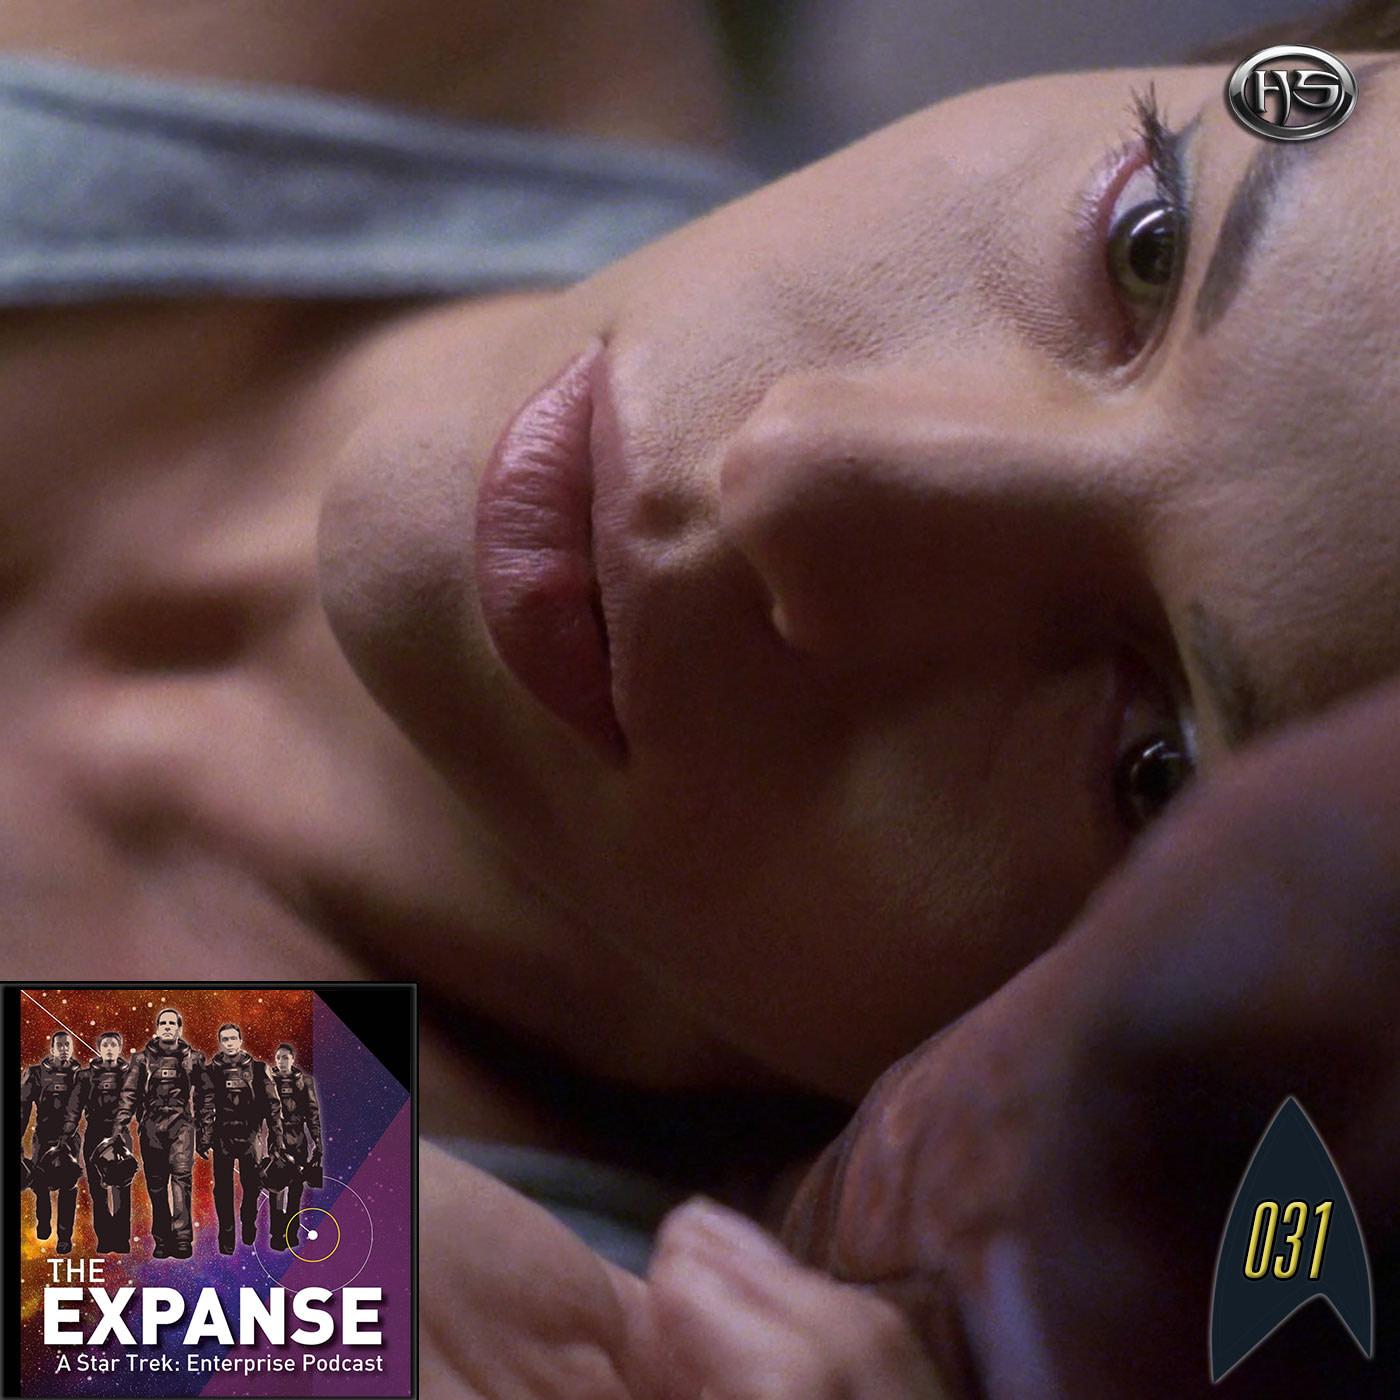 The Expanse Episode 31